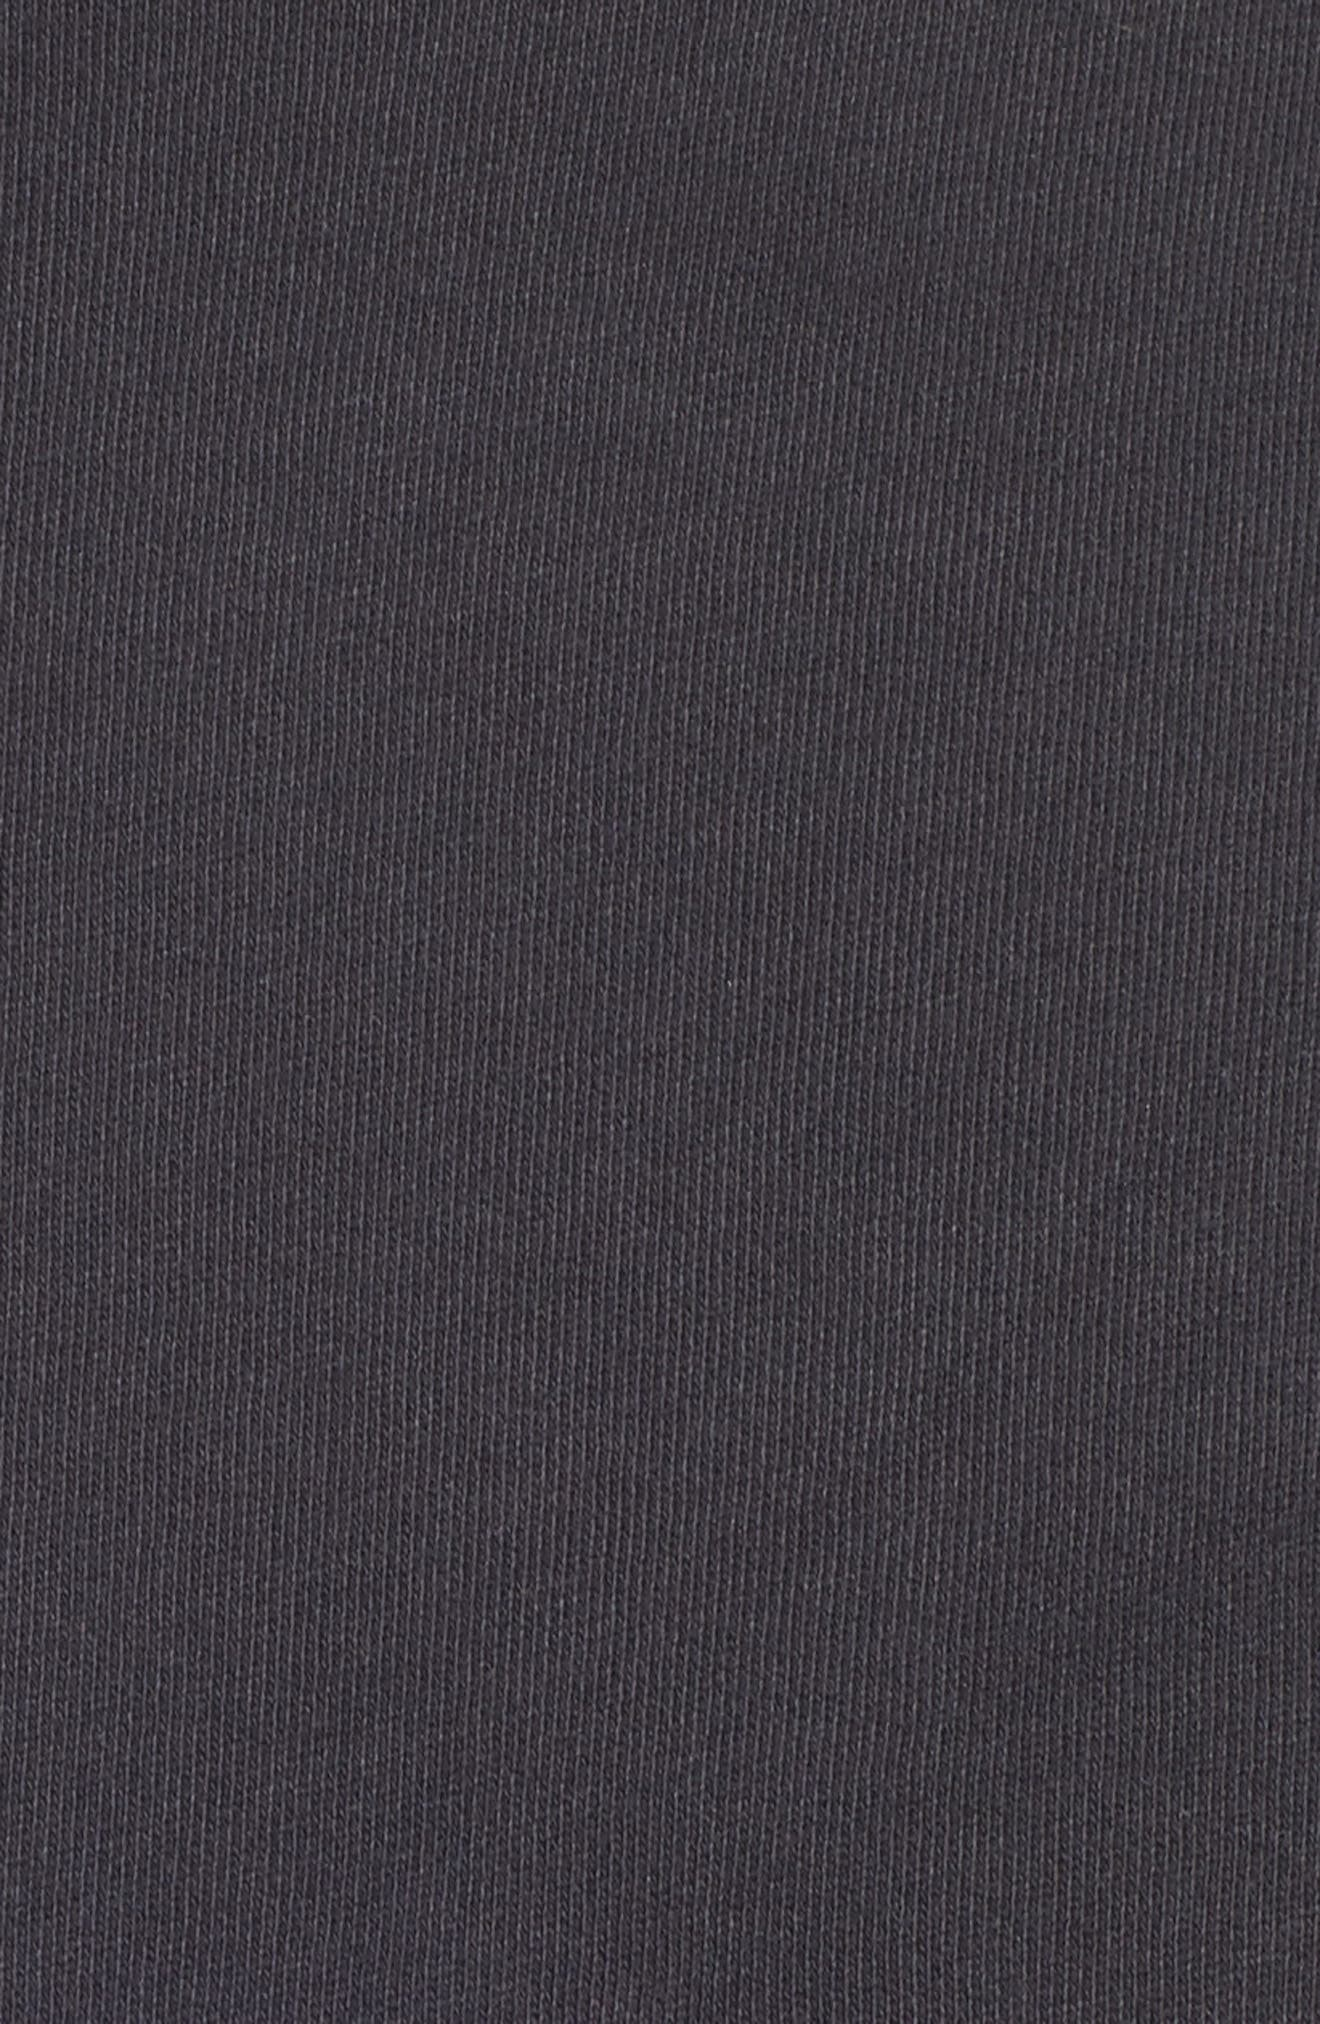 Alexa - Splash Sweatshirt,                             Alternate thumbnail 5, color,                             Black